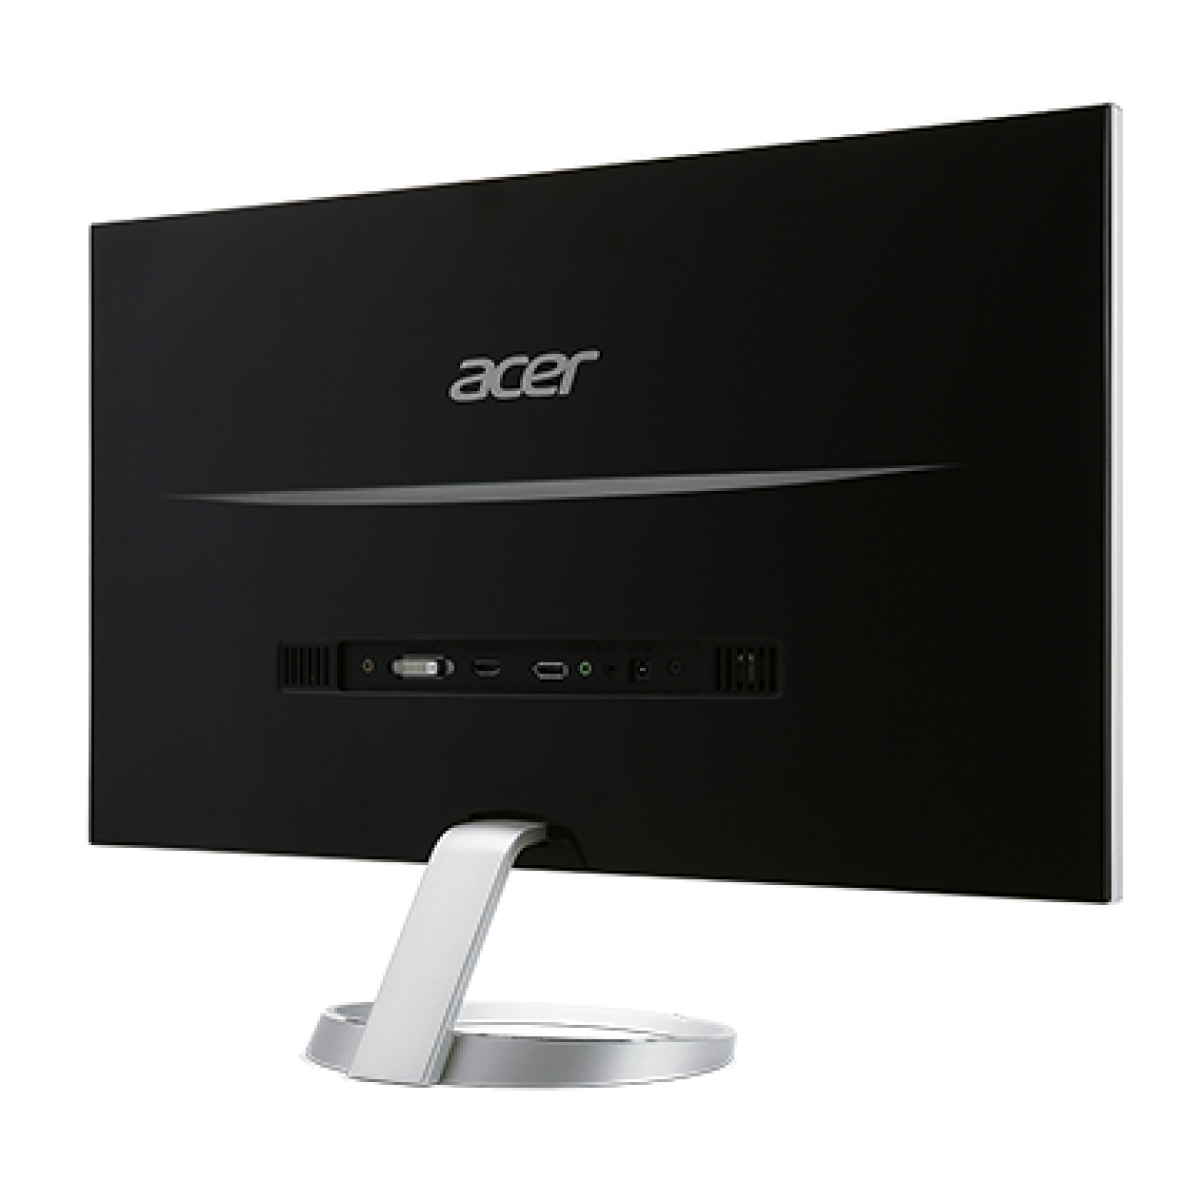 Monitor Gamer Acer 27 Pol, WQHD, 60Hz, 4ms, H277HU